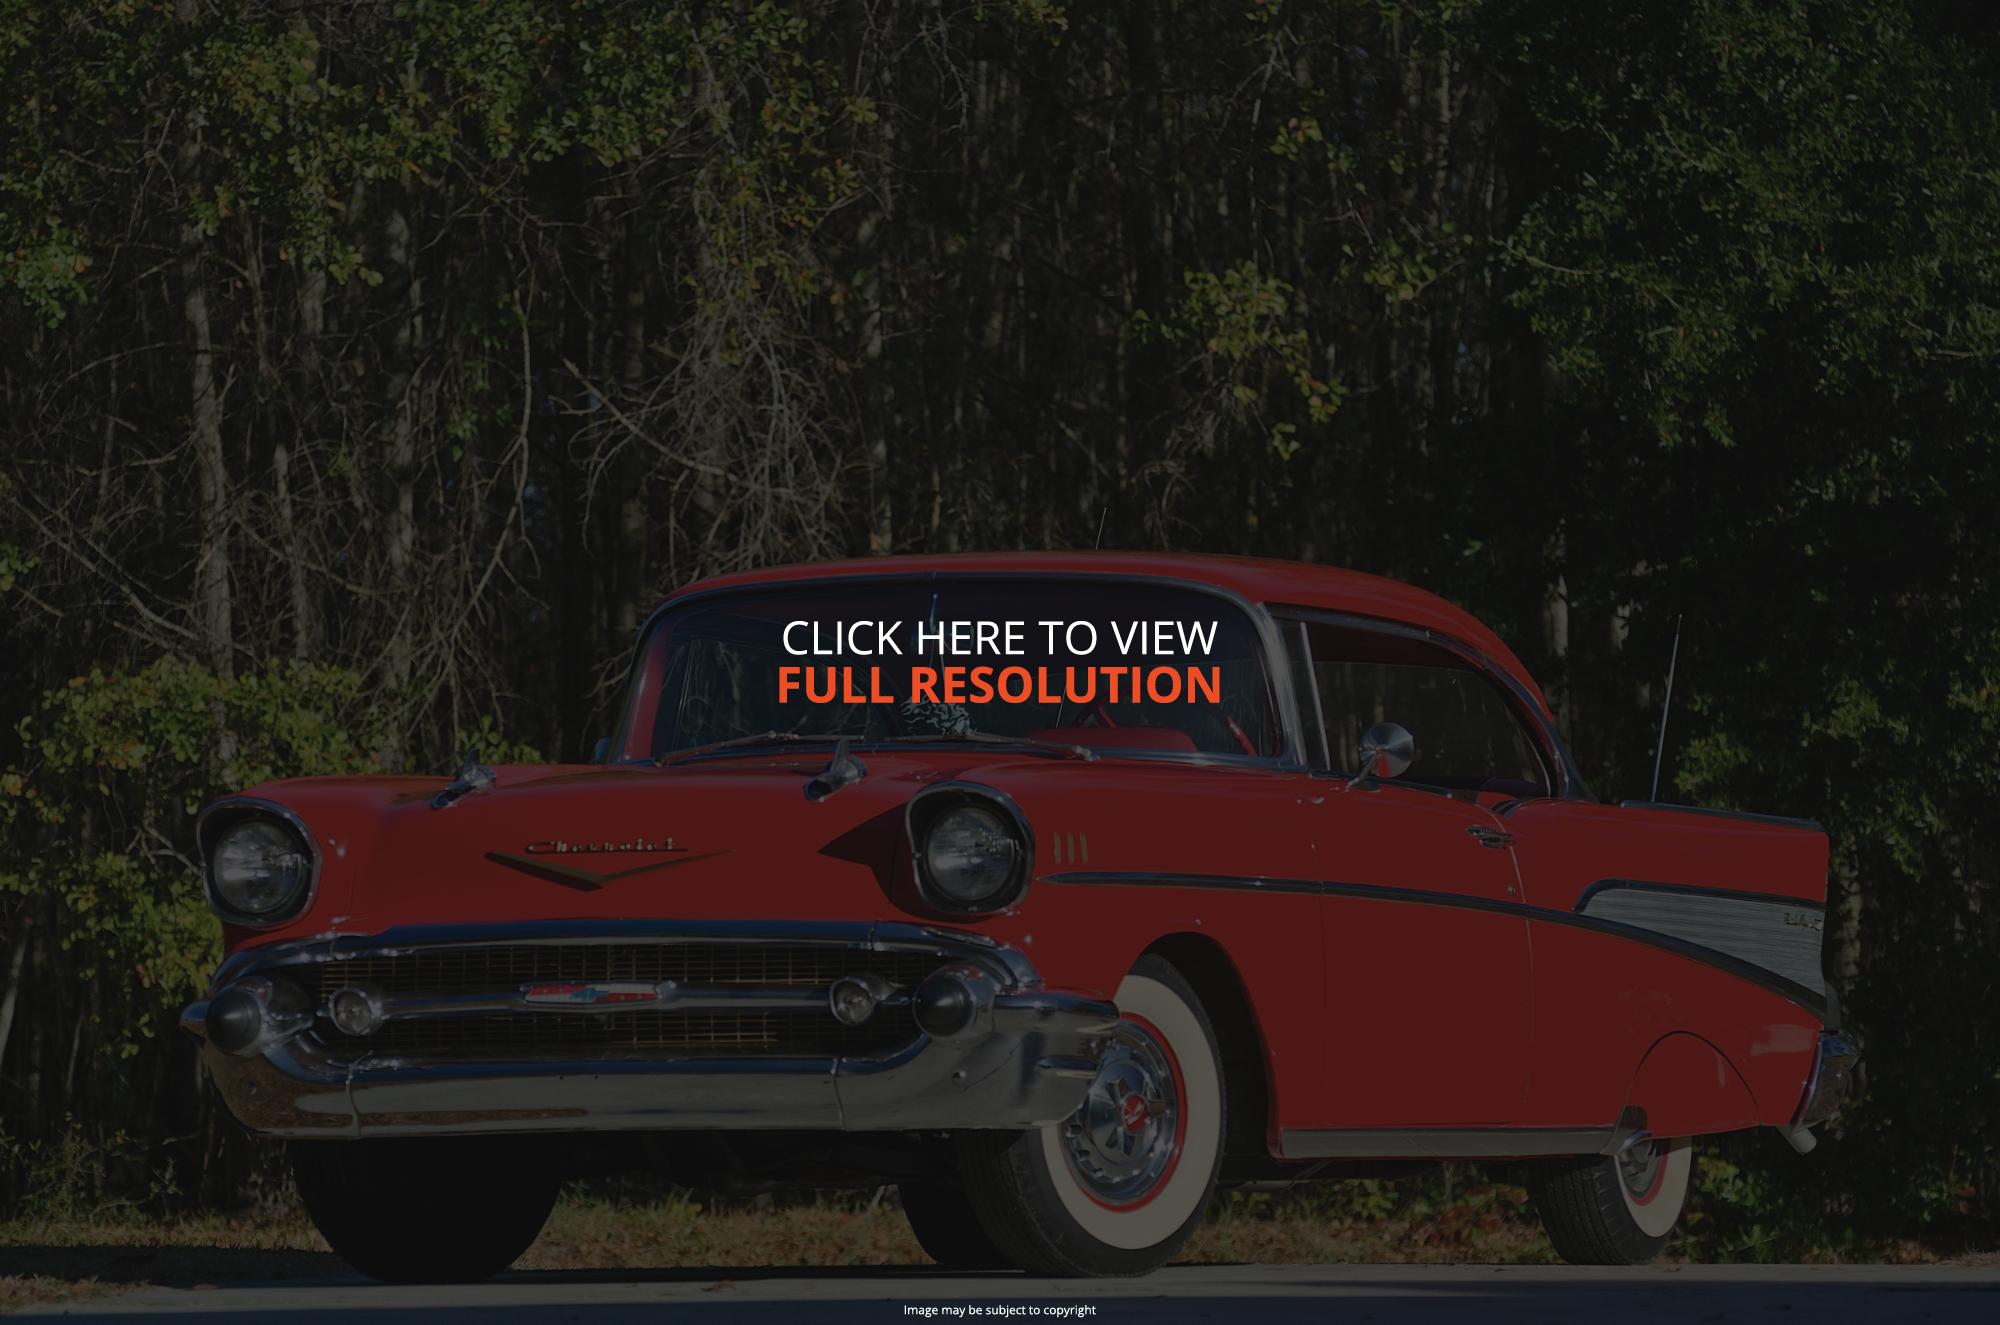 Chevrolet Bel air 1959 foto - 5